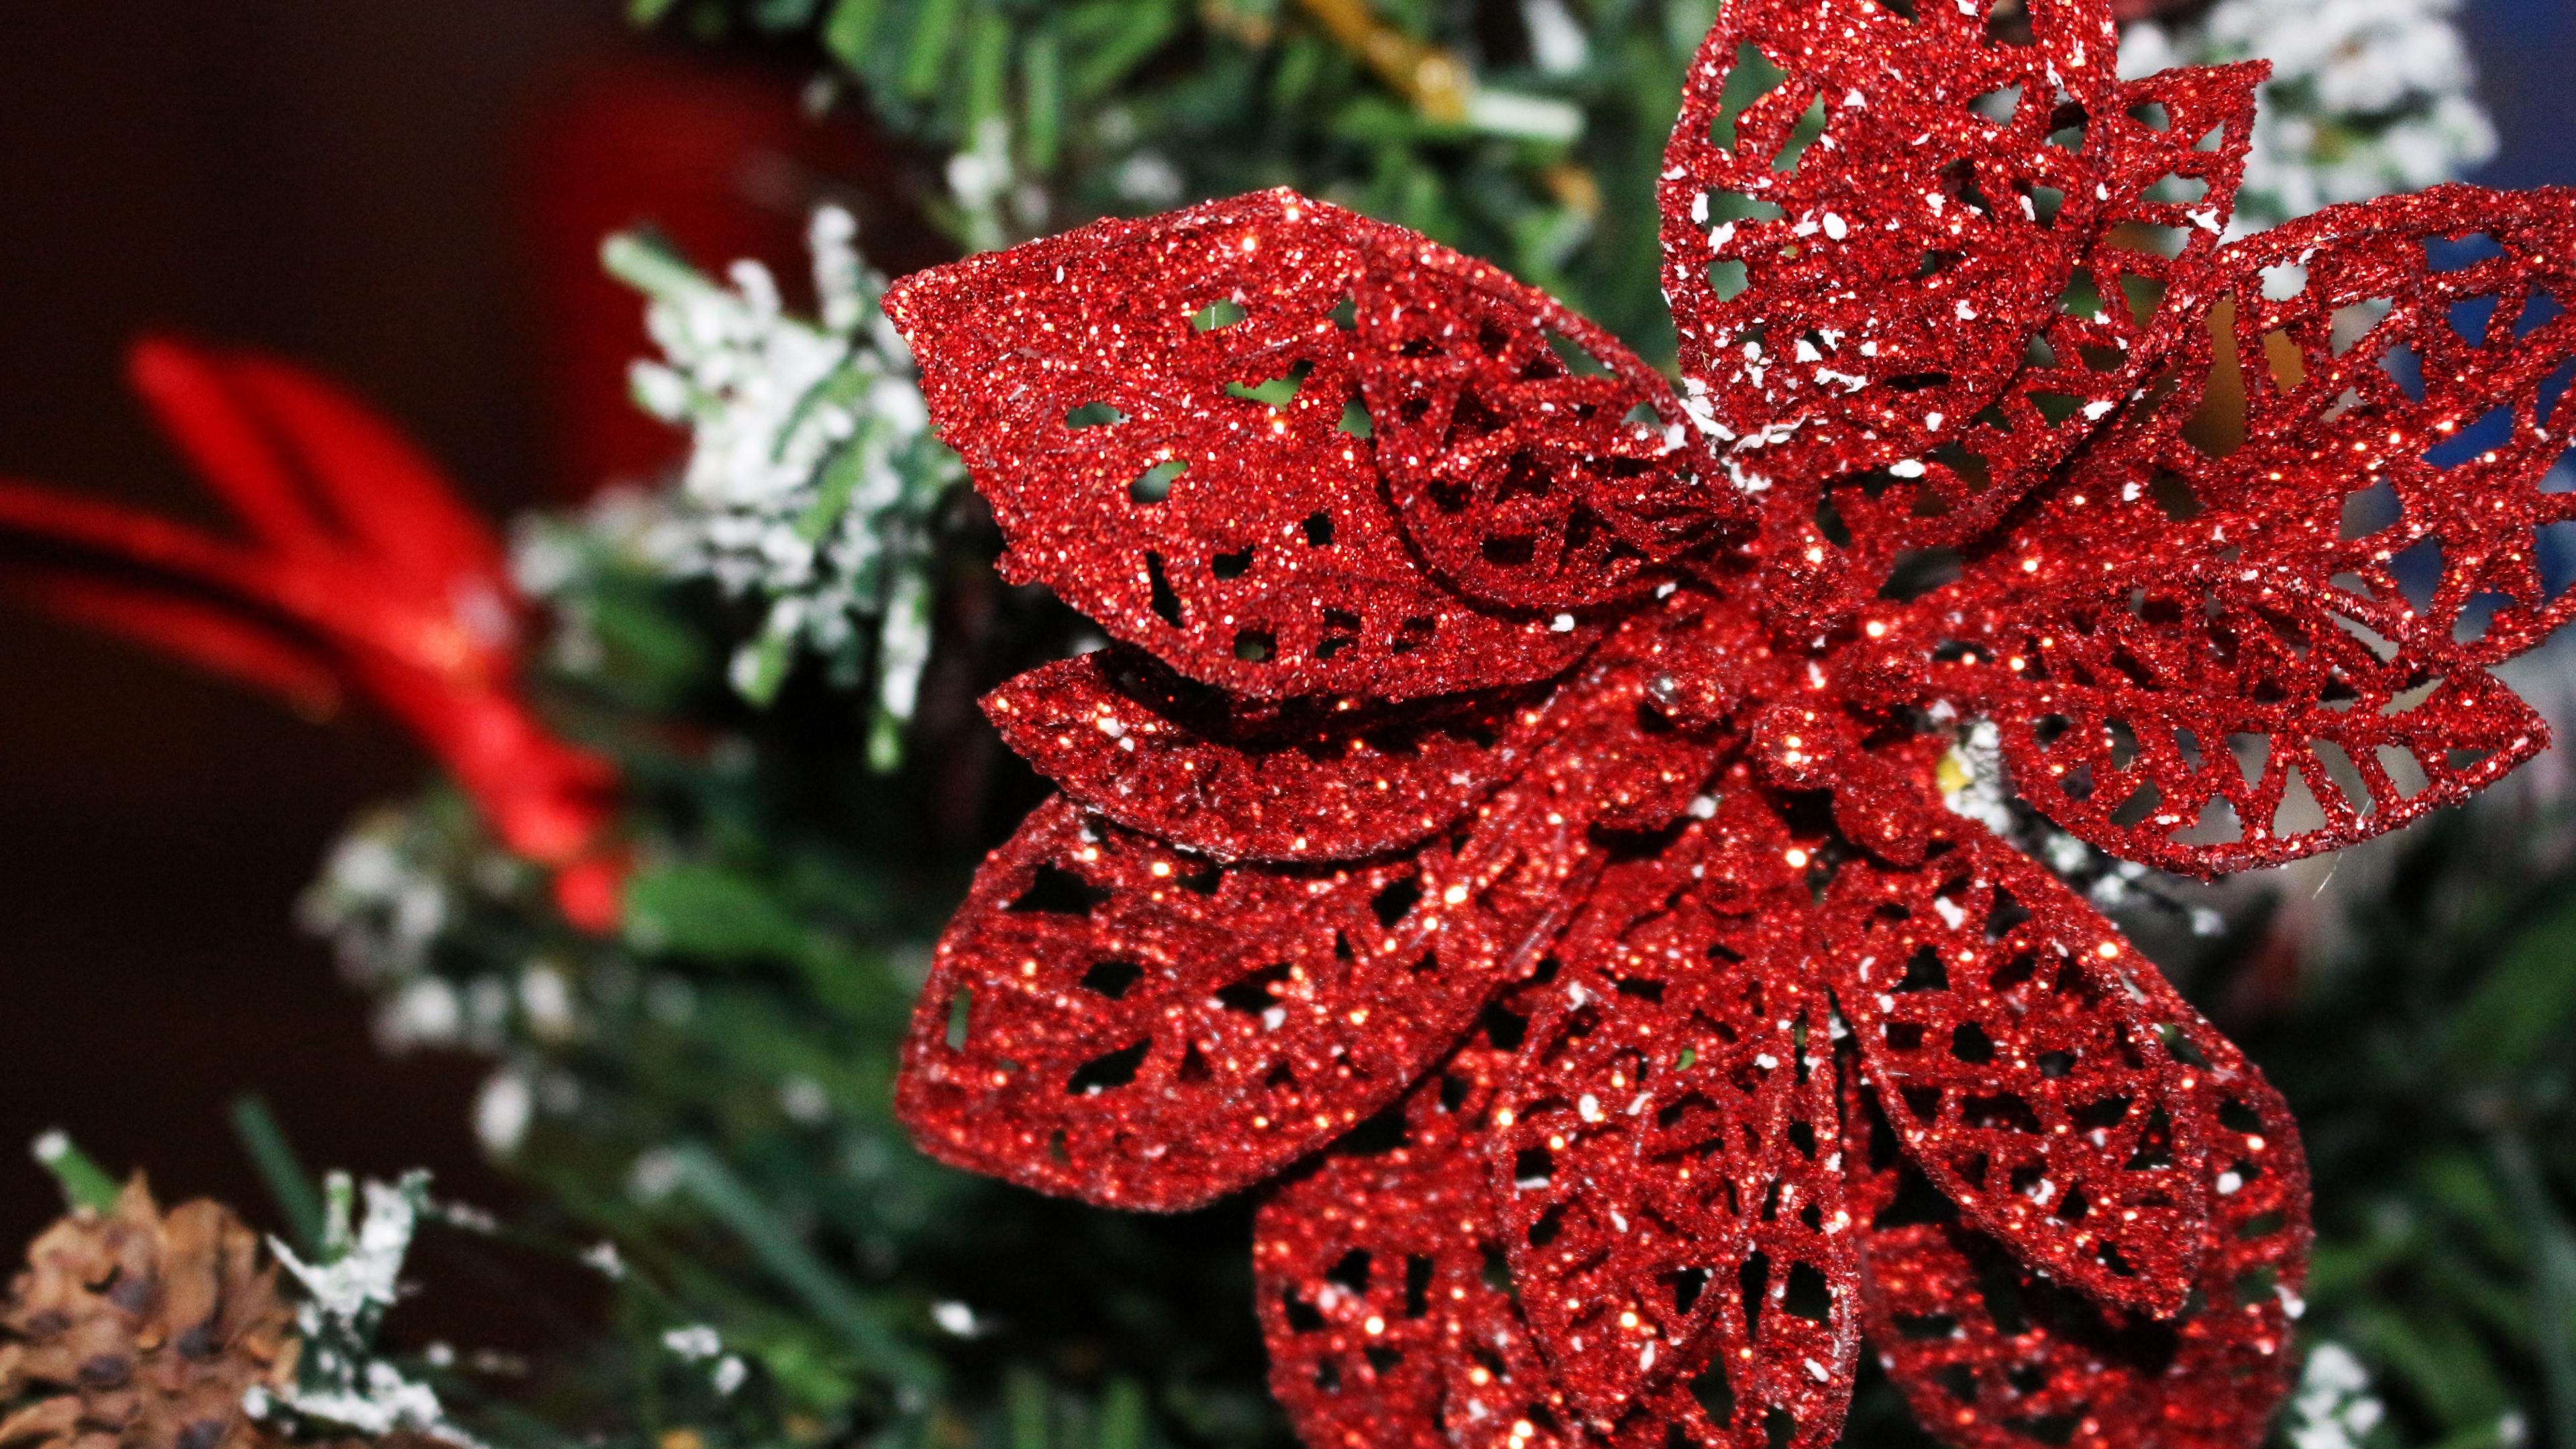 ornament christmas ornaments poinsettia decoration 4k 1538344550 - ornament, christmas ornaments, poinsettia, decoration 4k - Poinsettia, ornament, christmas ornaments